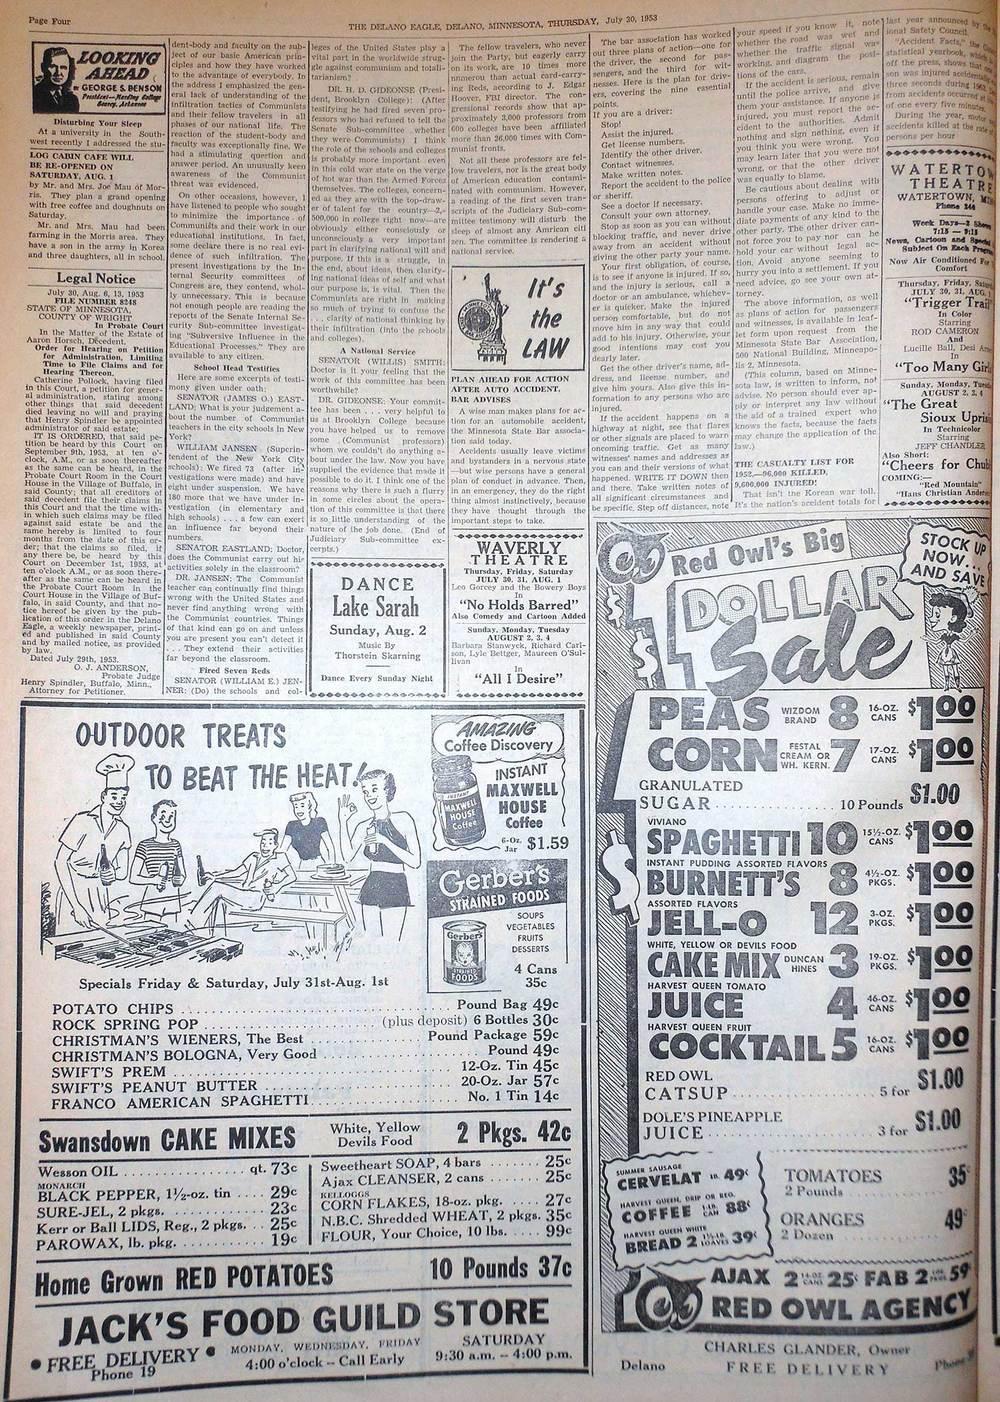 7/30/1953, p4